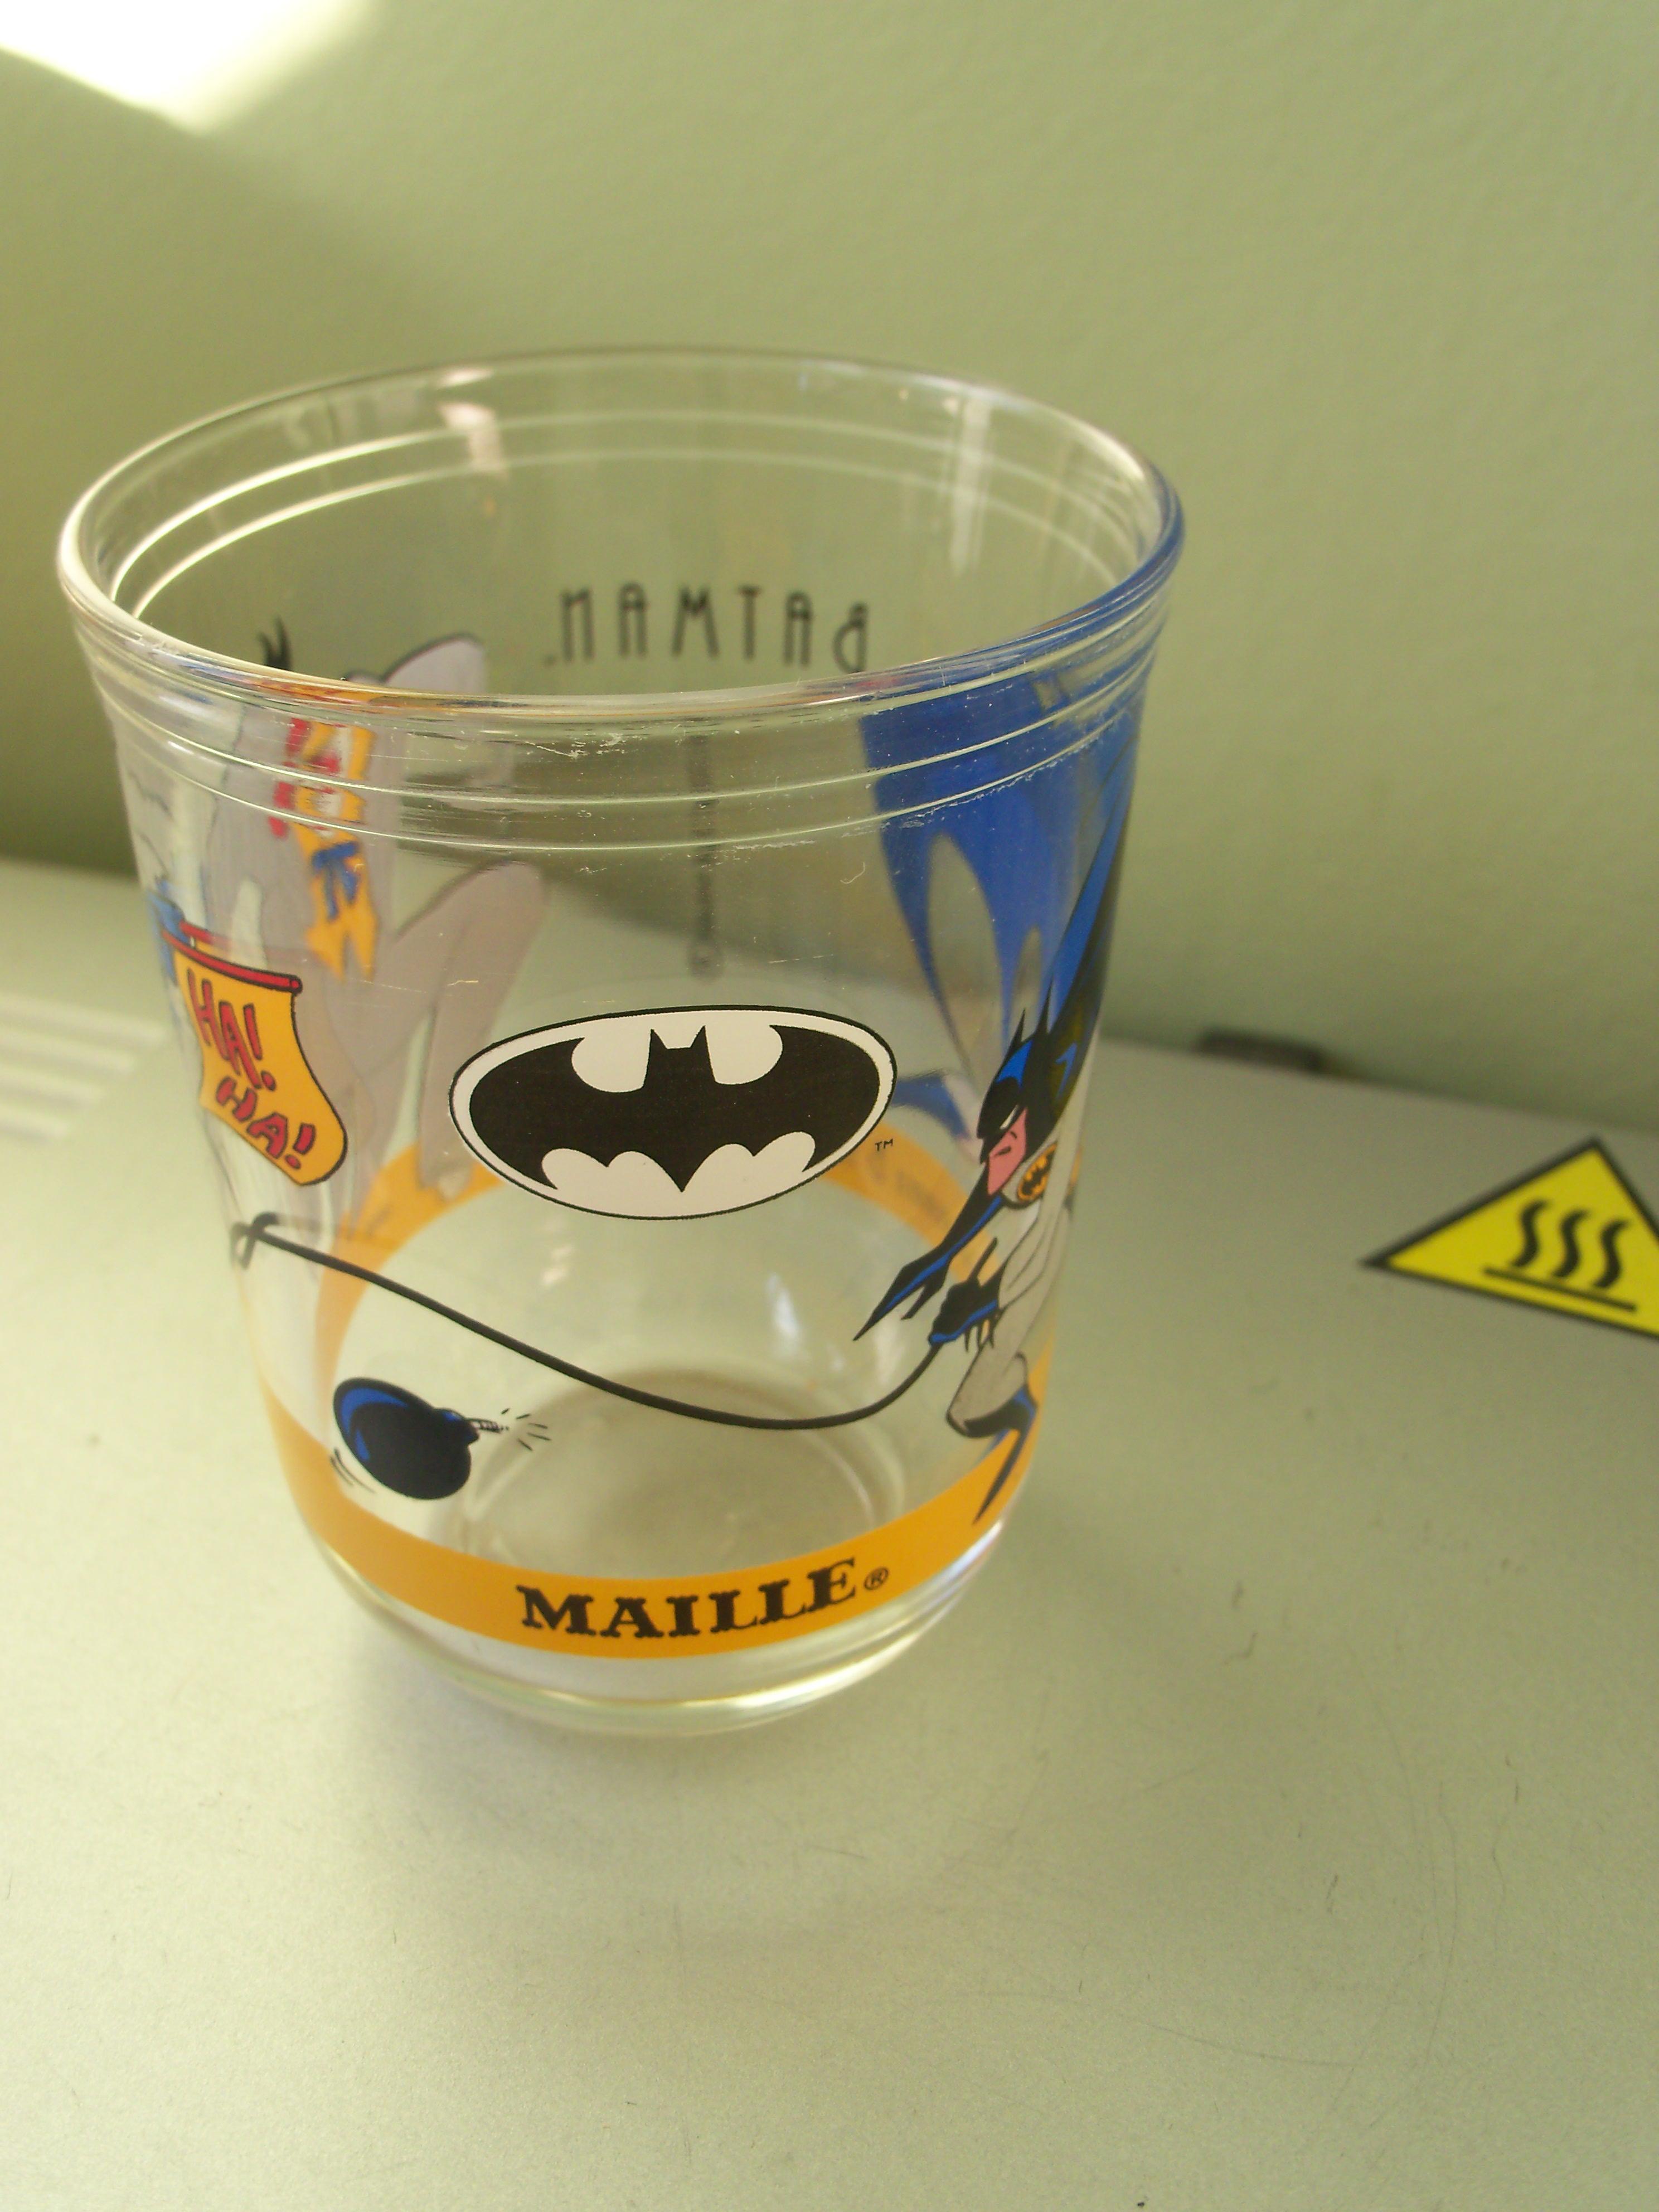 troc de troc verre batman image 2